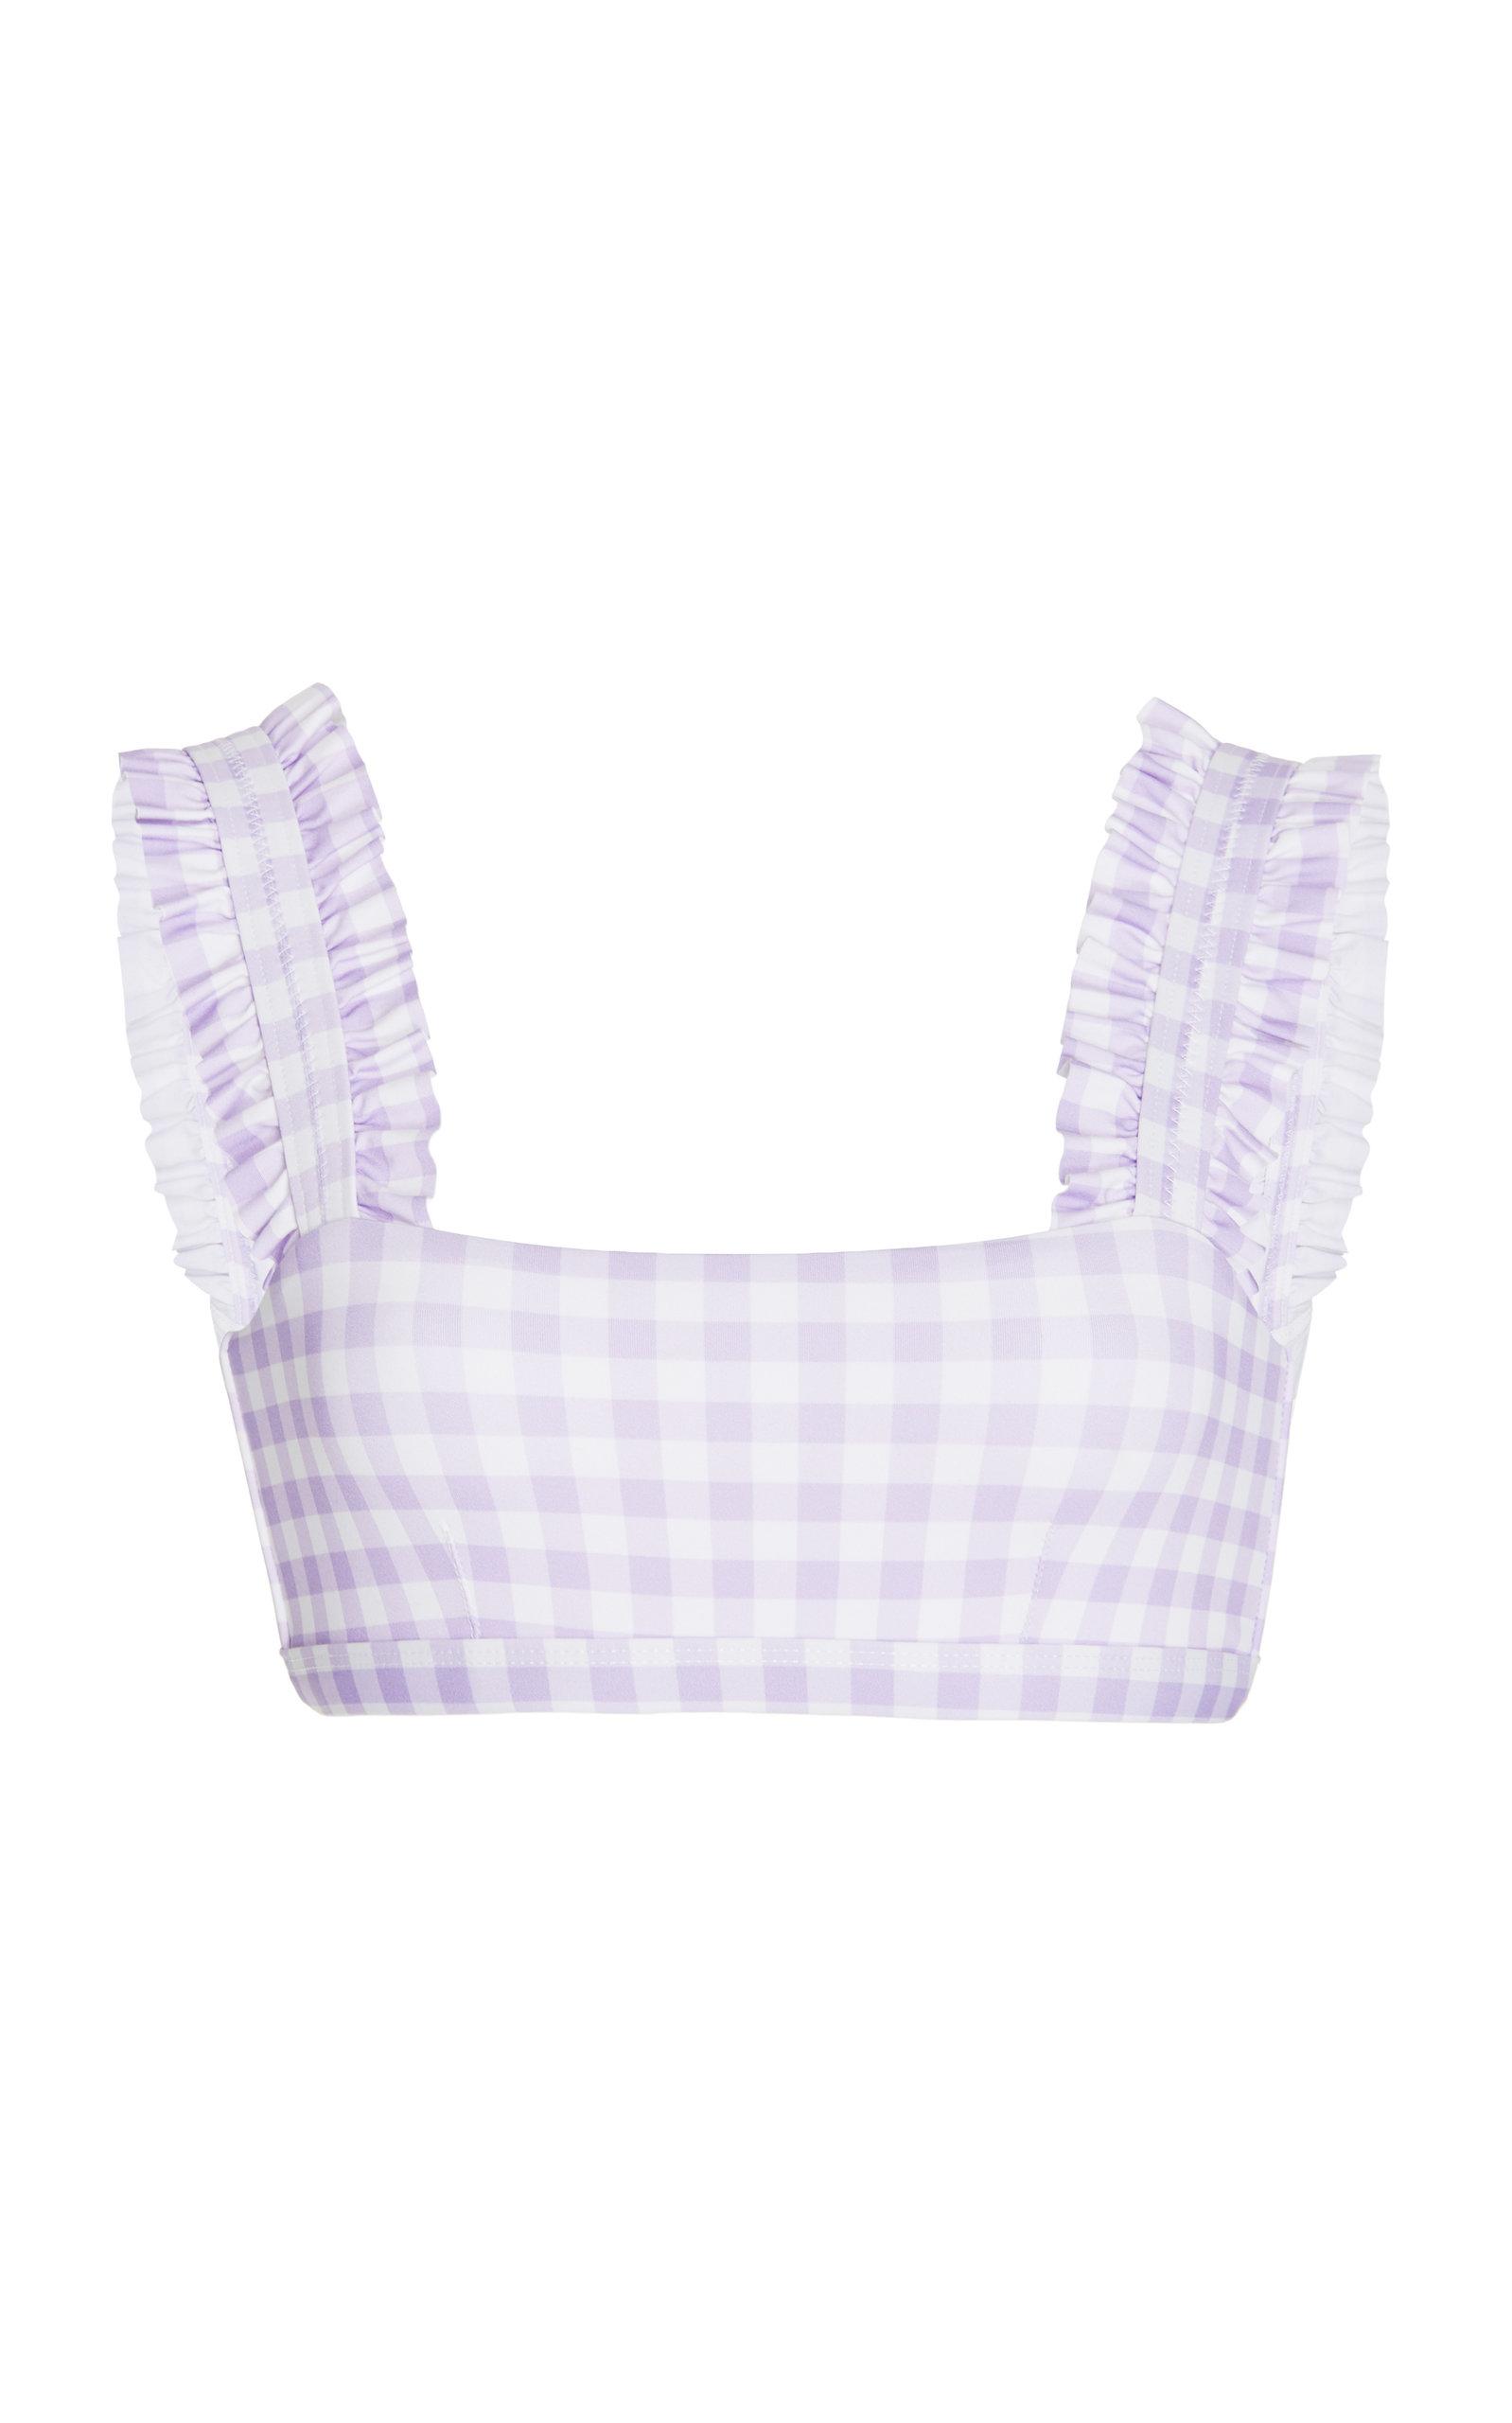 Women's Ruffled Gingham Bikini Top